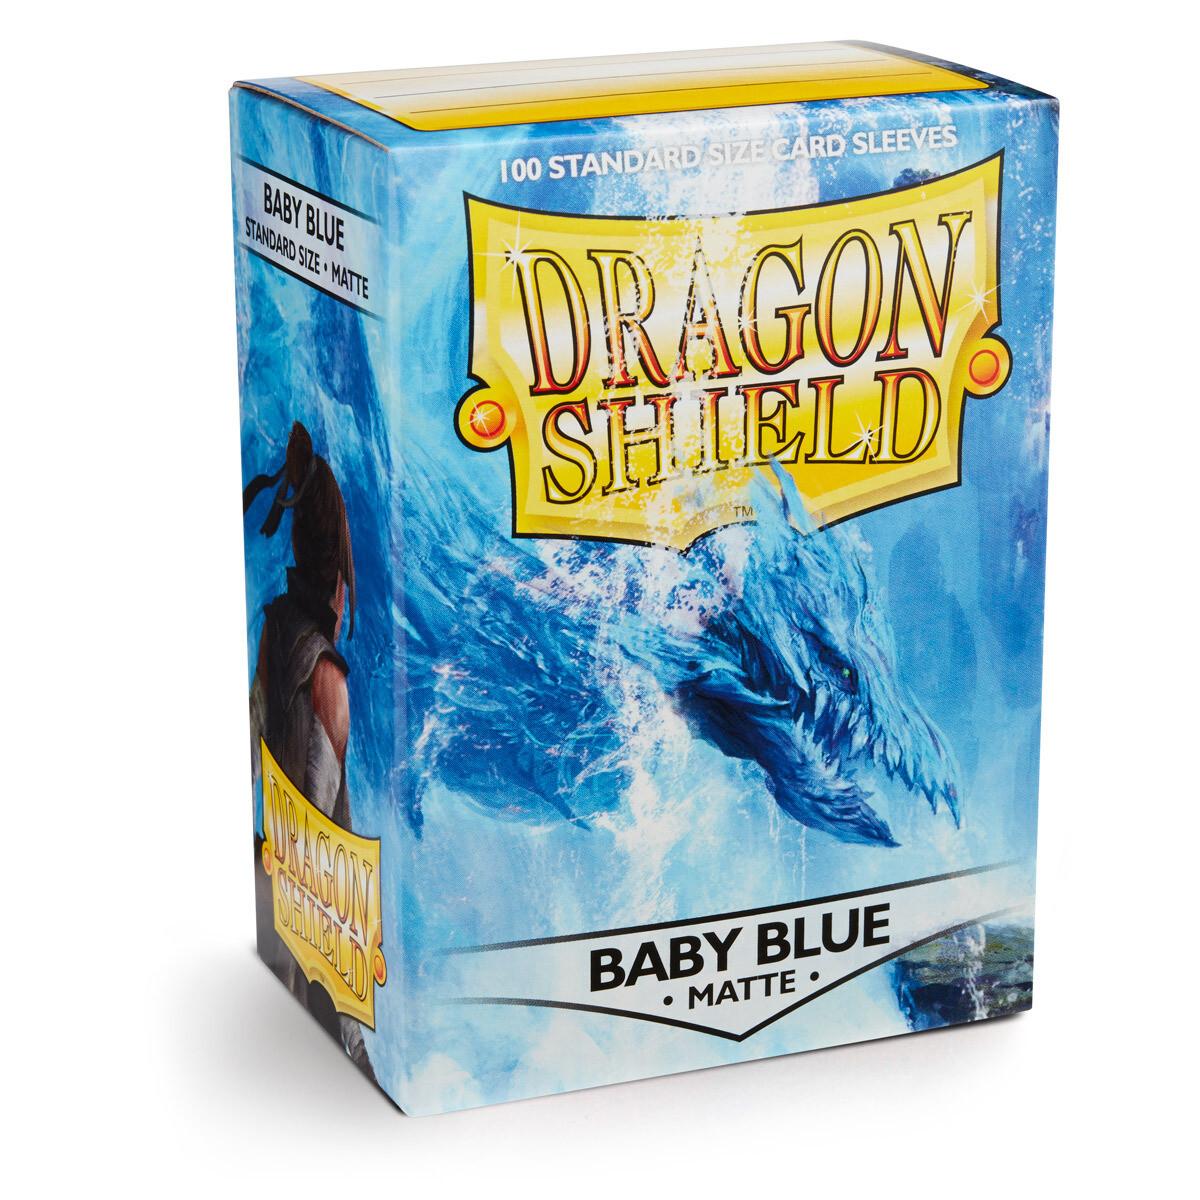 Dragon Shield 100 Sleeves - Matte Baby Blue